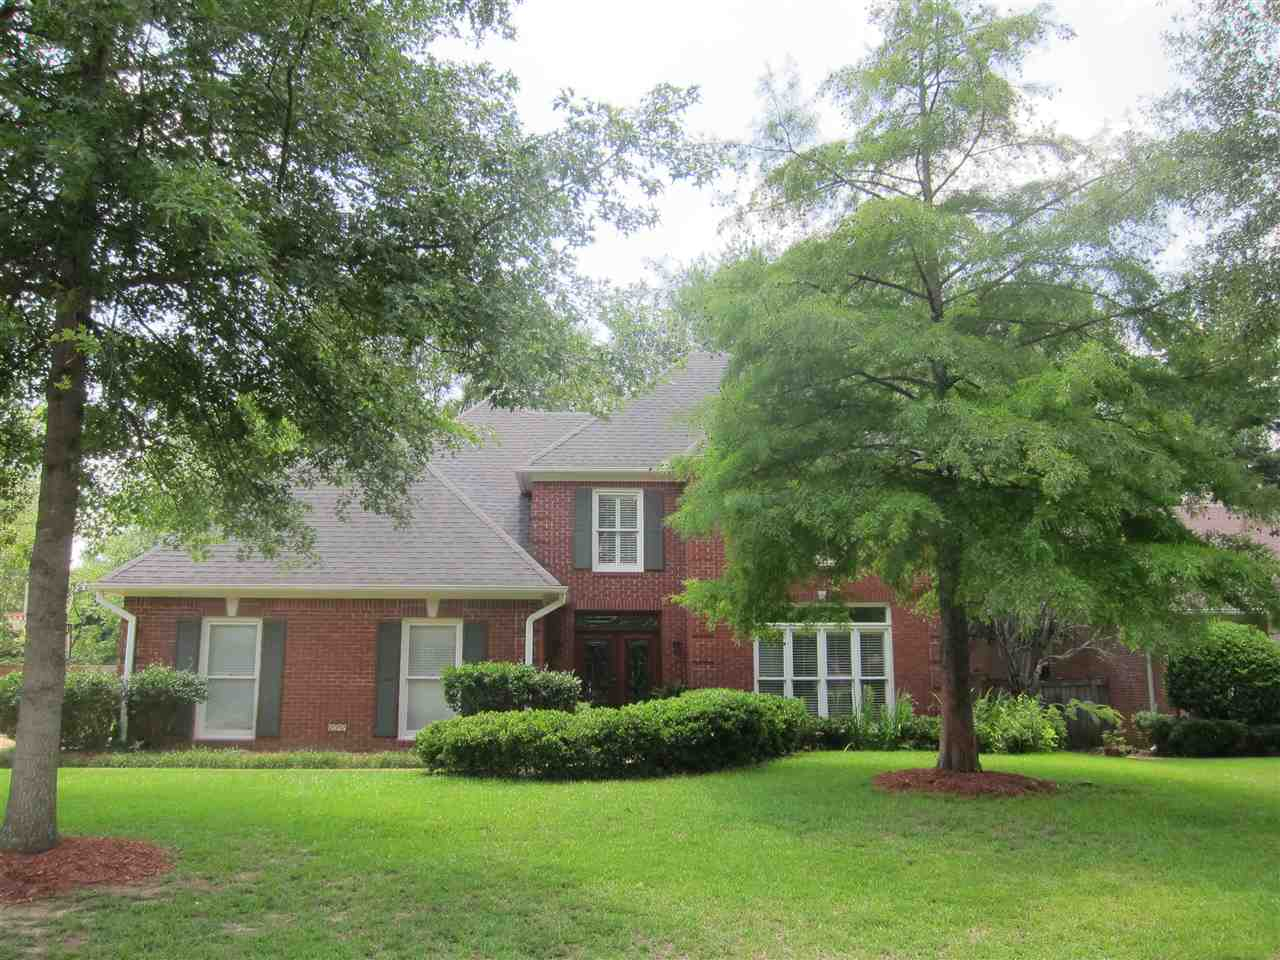 Real Estate for Sale, ListingId: 36236998, Ridgeland,MS39157